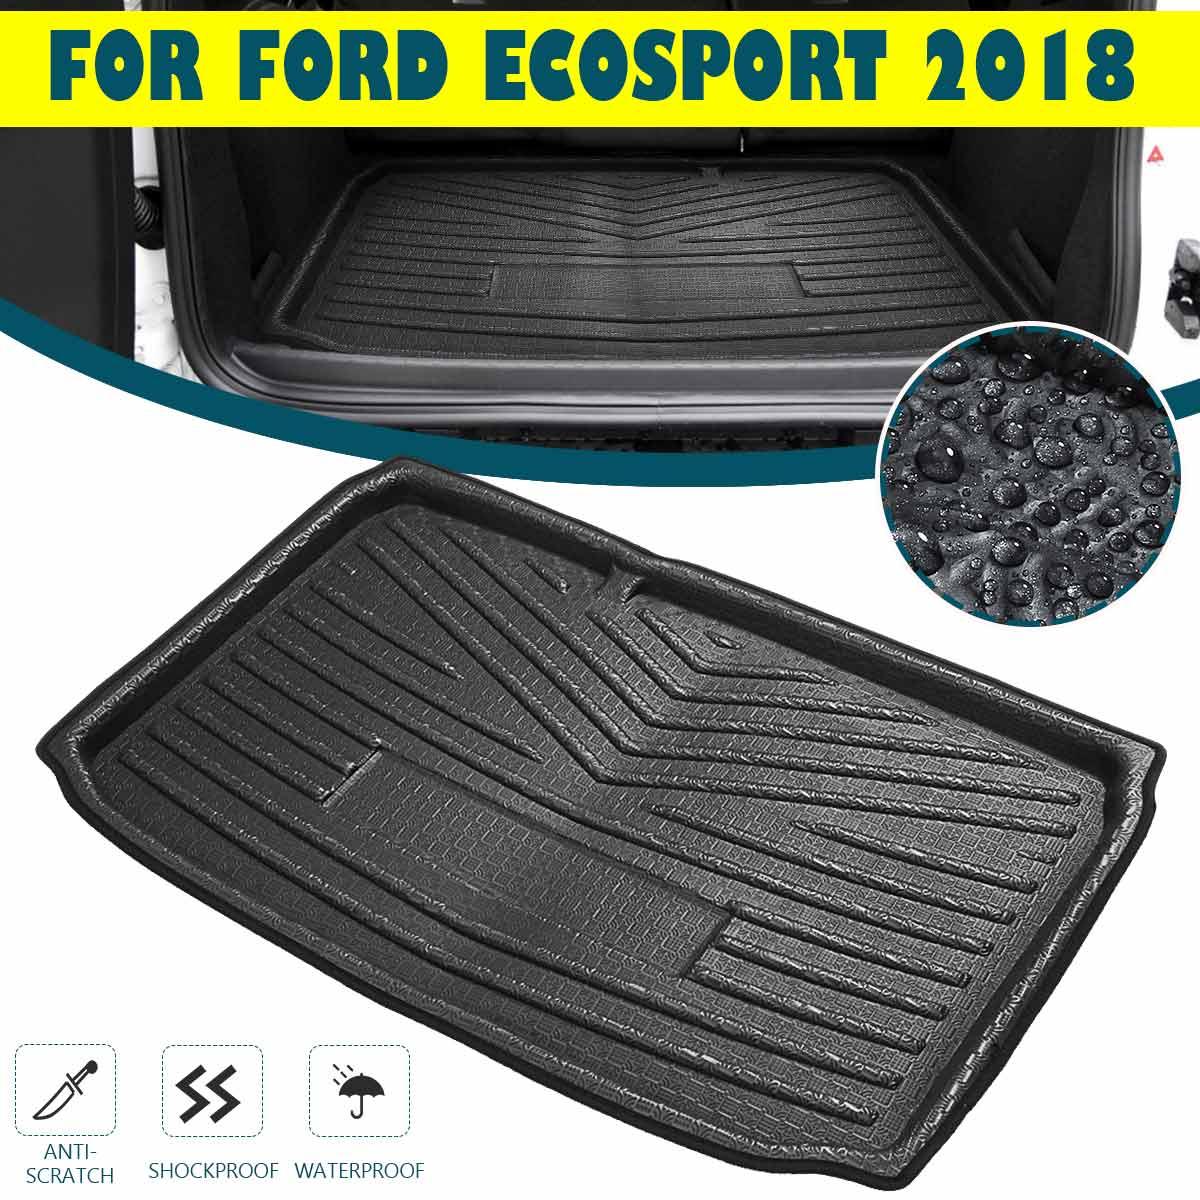 Boot Cargo Liner Kofferbak Mat Liner Vloer Tapijt Bagage Cargo Tray Voor Ford Ecosport 2018 2019 2020 + Kick pad Modder Antislip